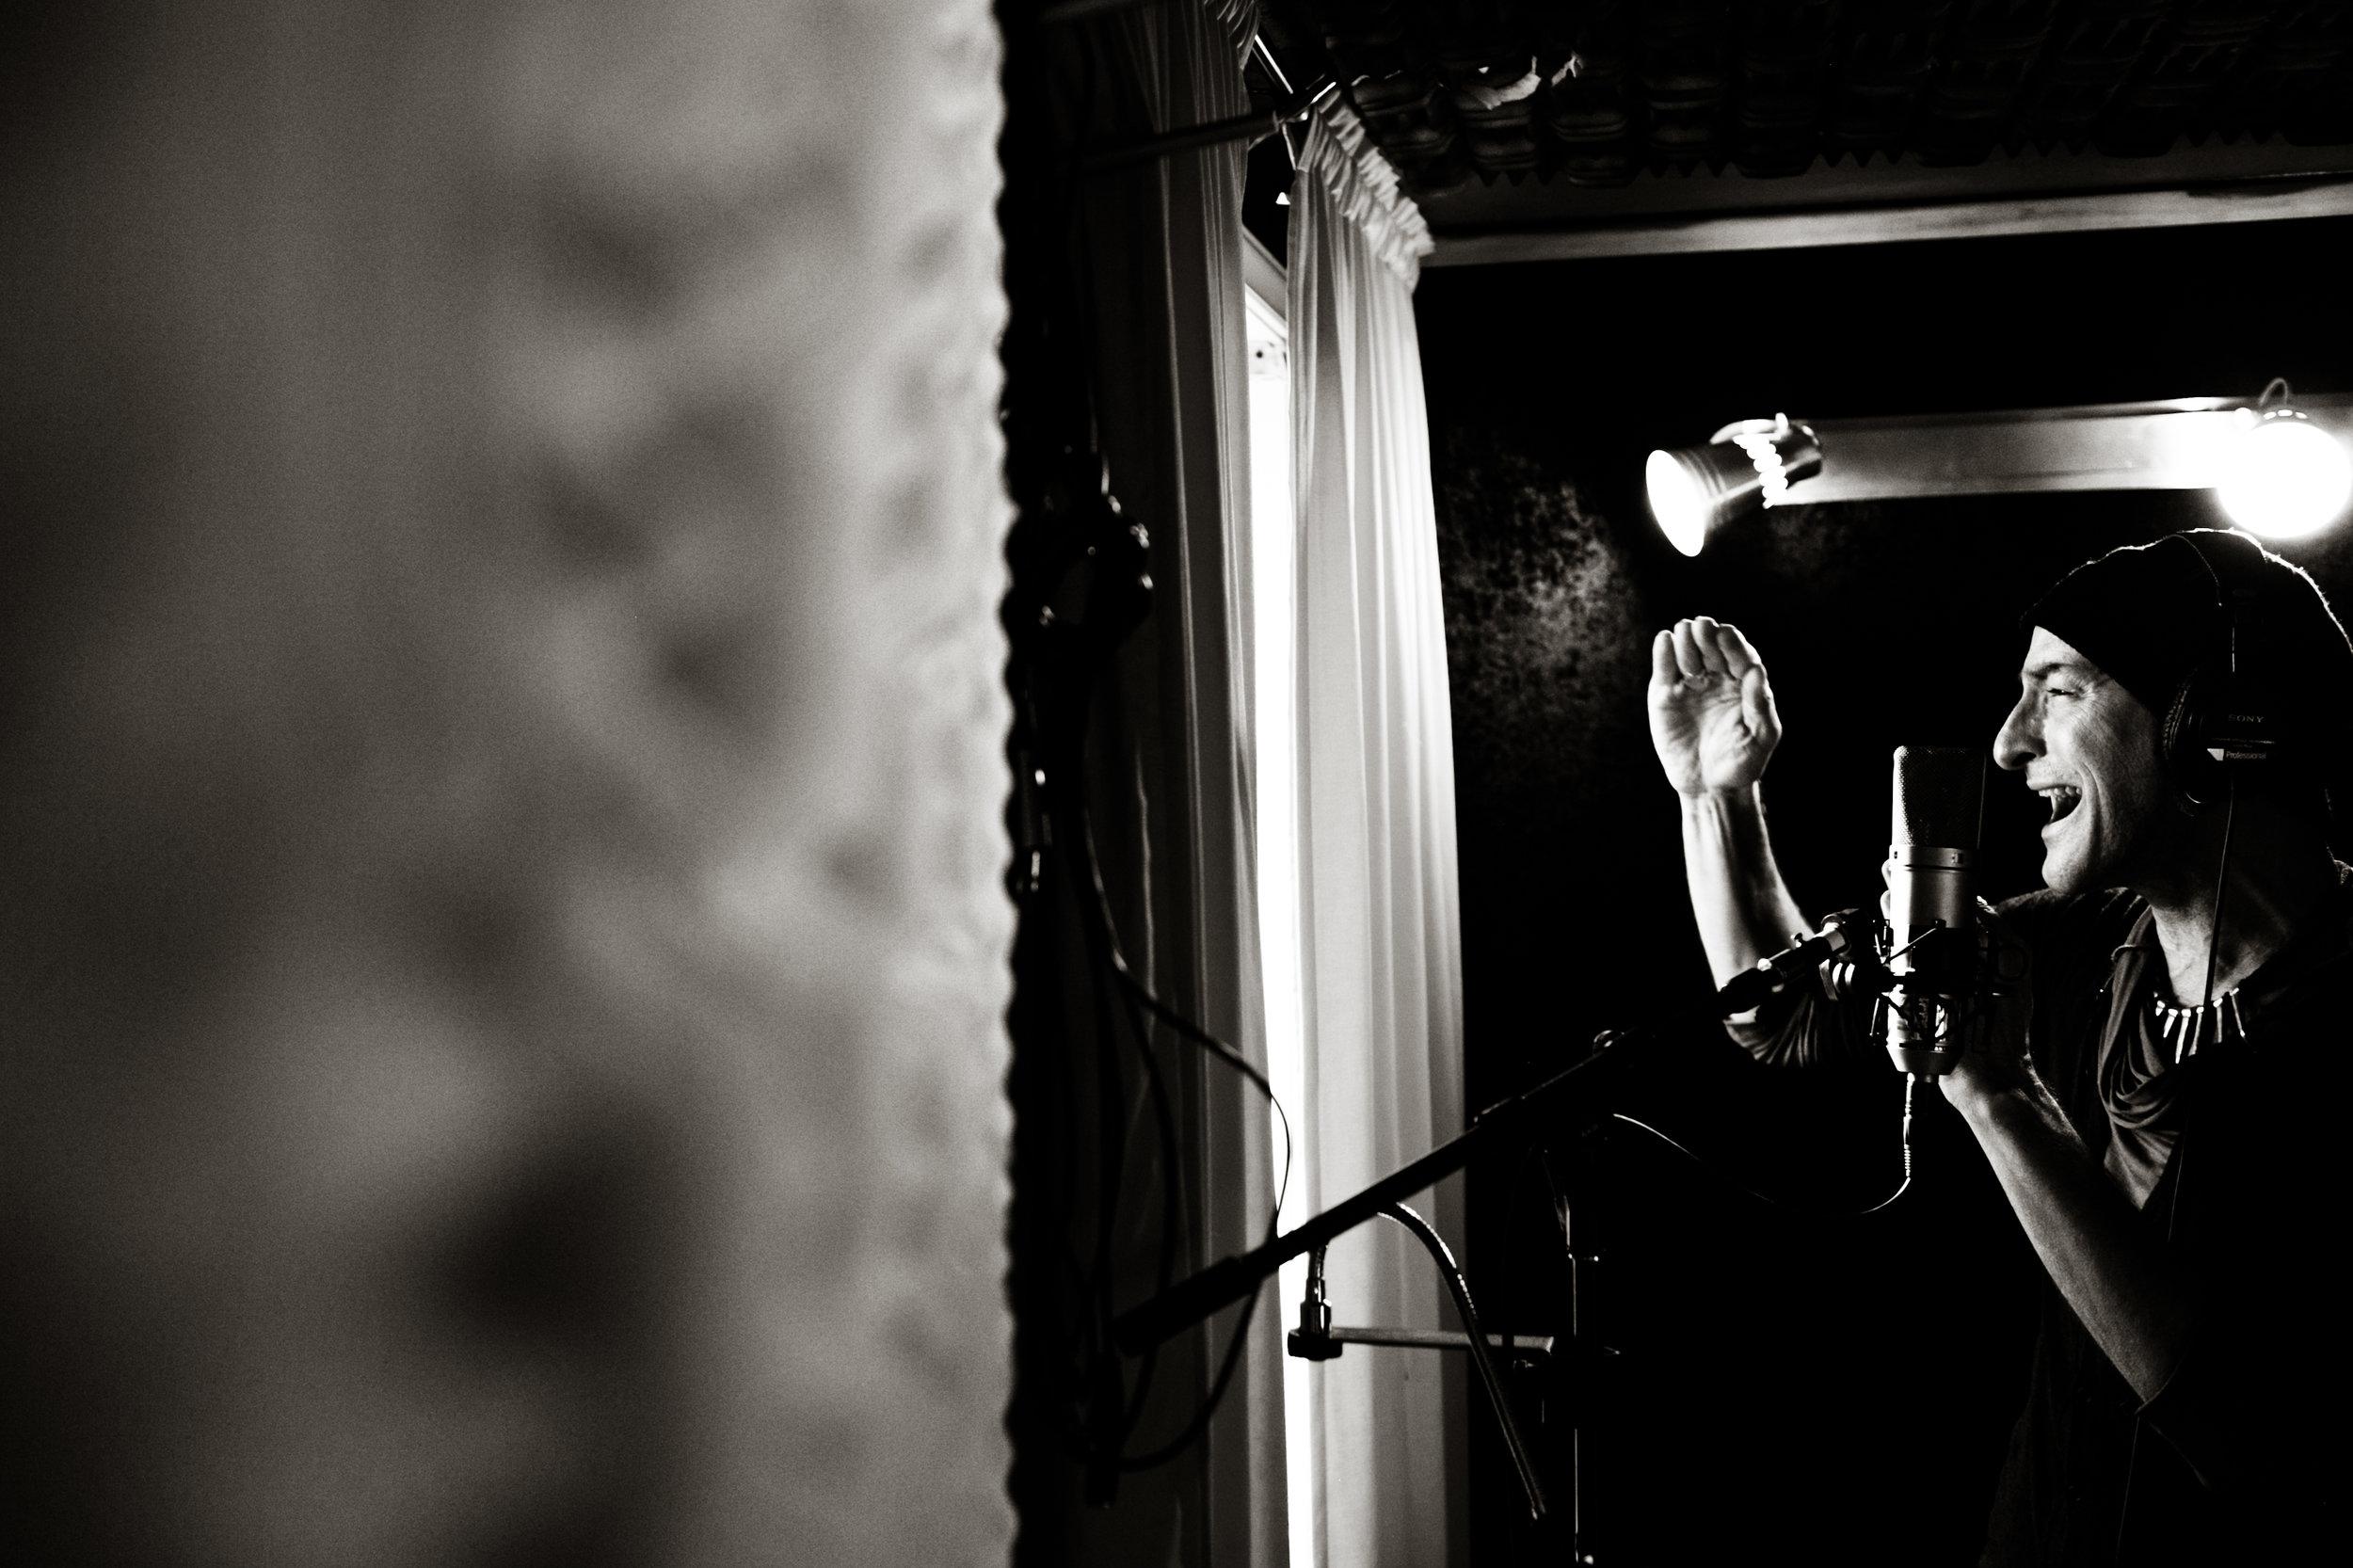 019_London-Bridge-Studios-Rafe-Pearlman.jpg